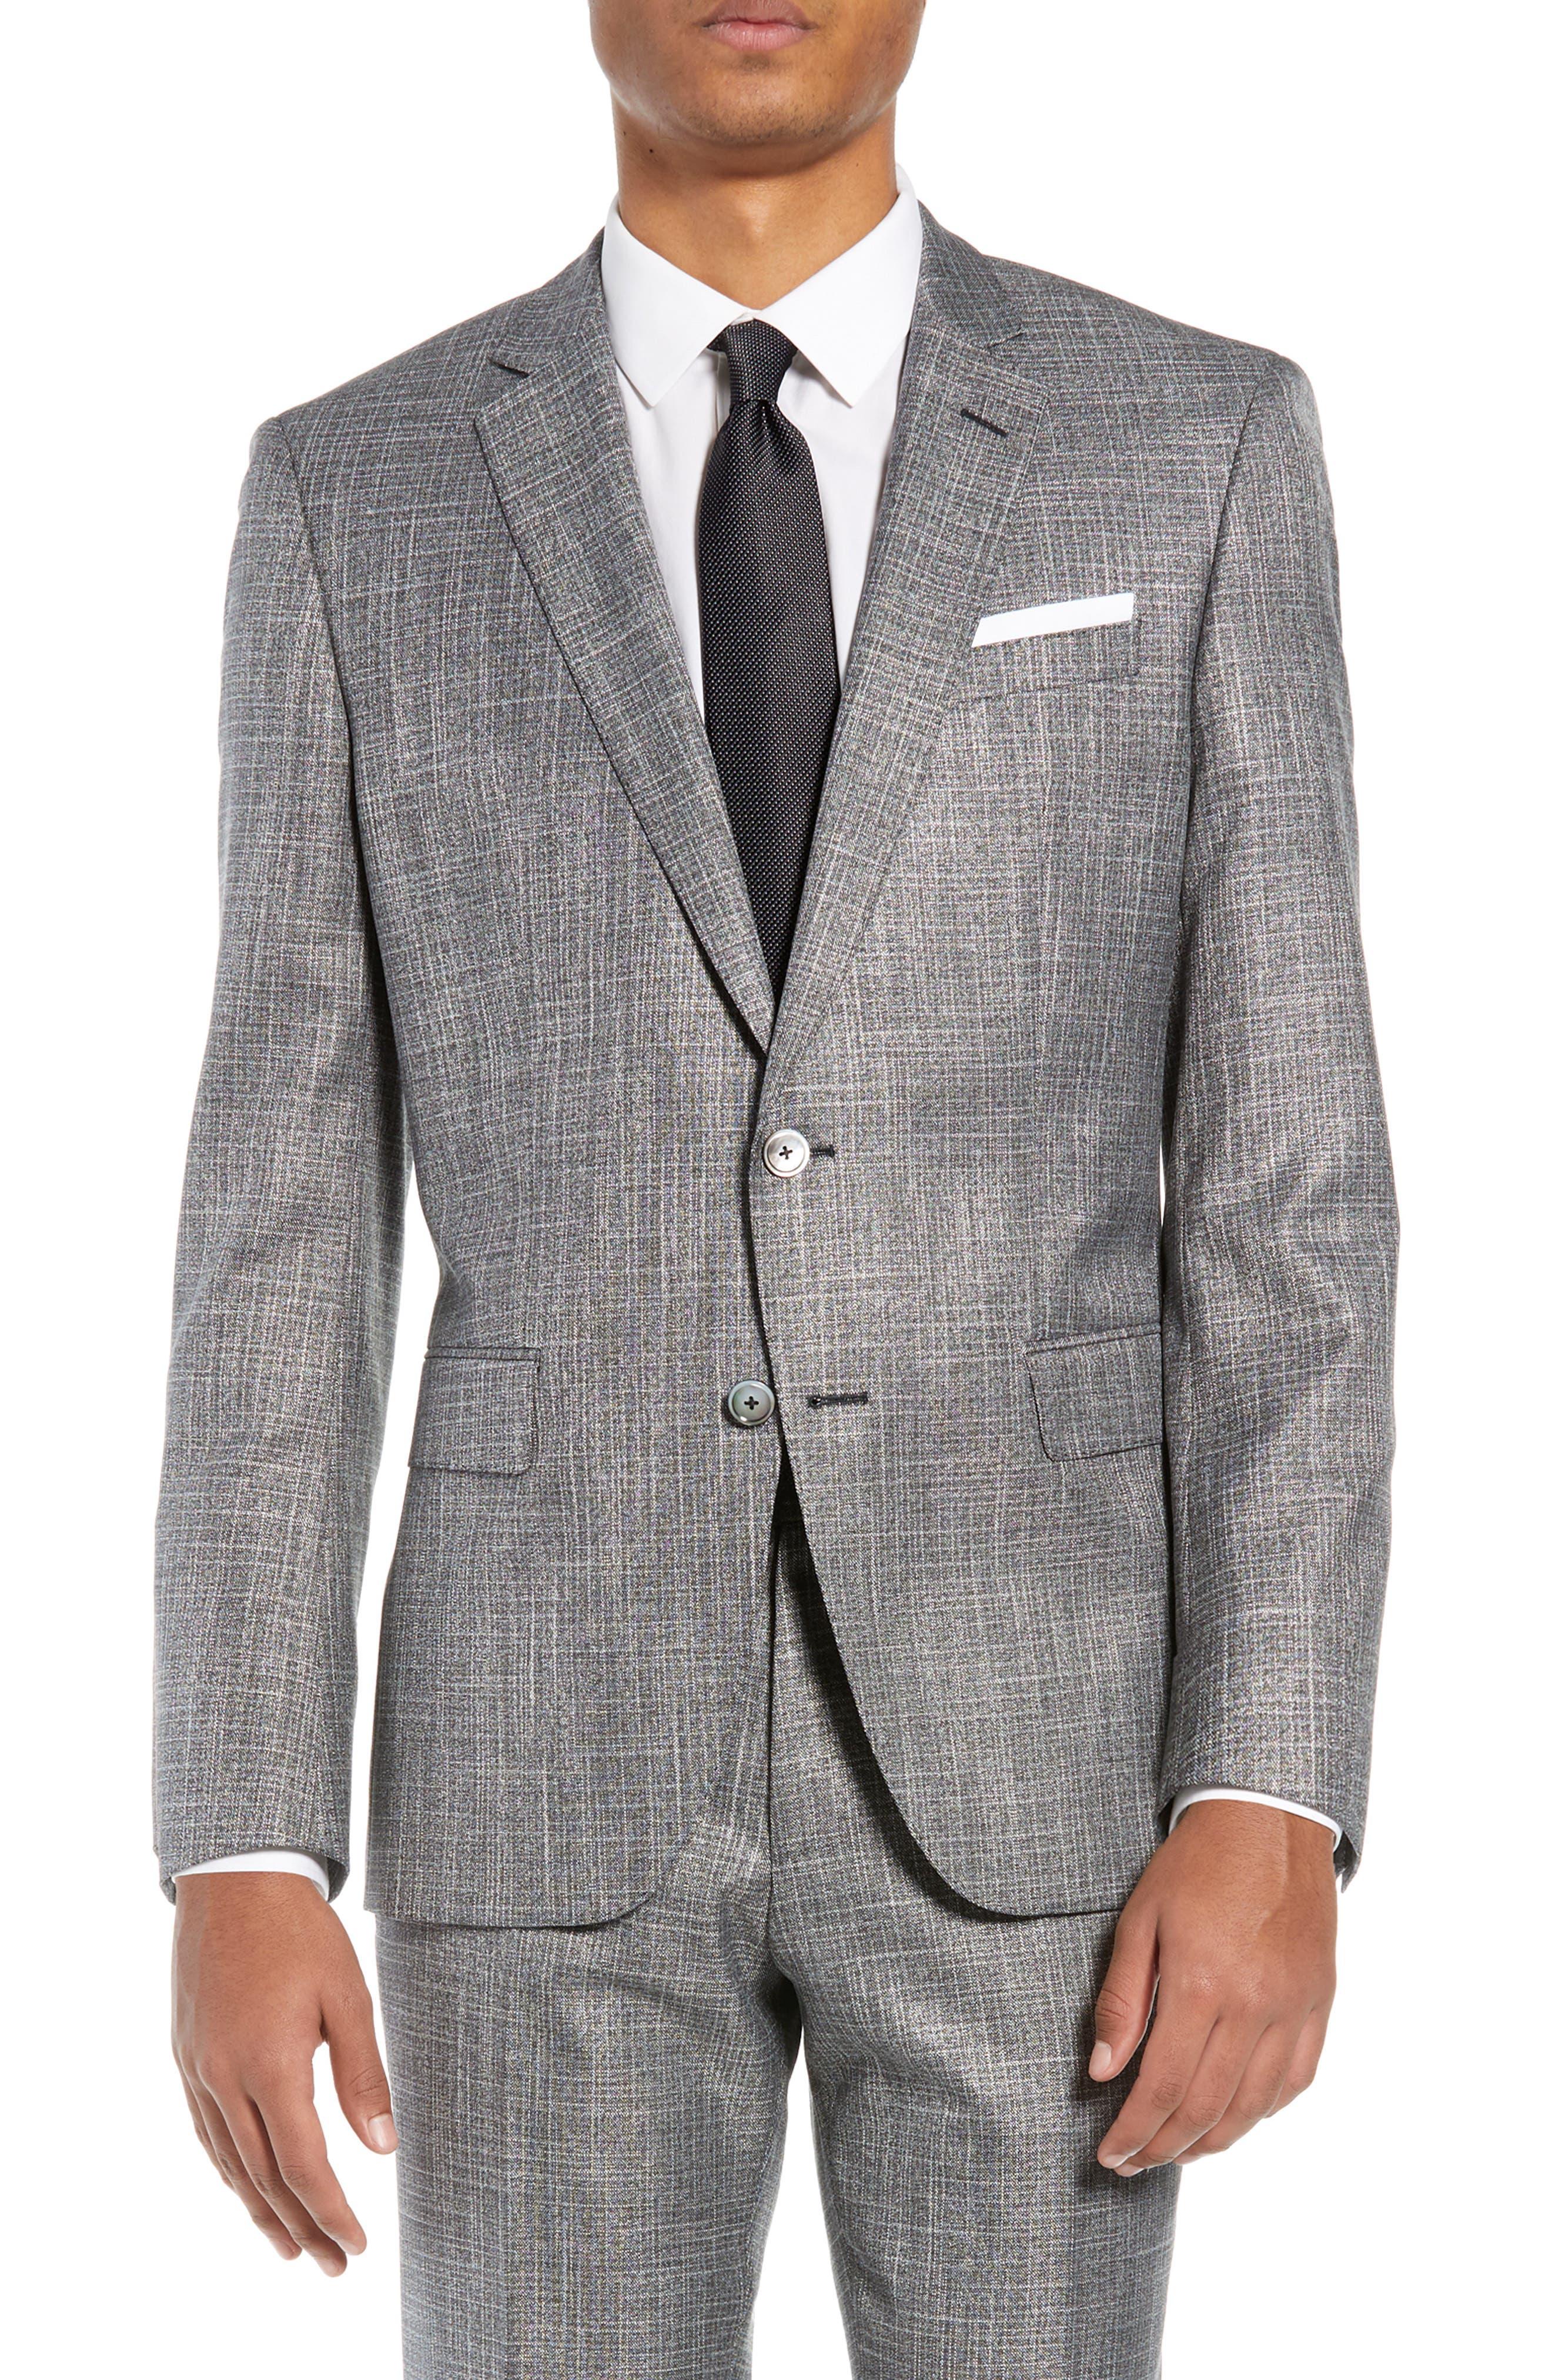 Hutson/Gander Trim Fit Solid Wool Blend Suit,                             Alternate thumbnail 5, color,                             MEDIUM GREY